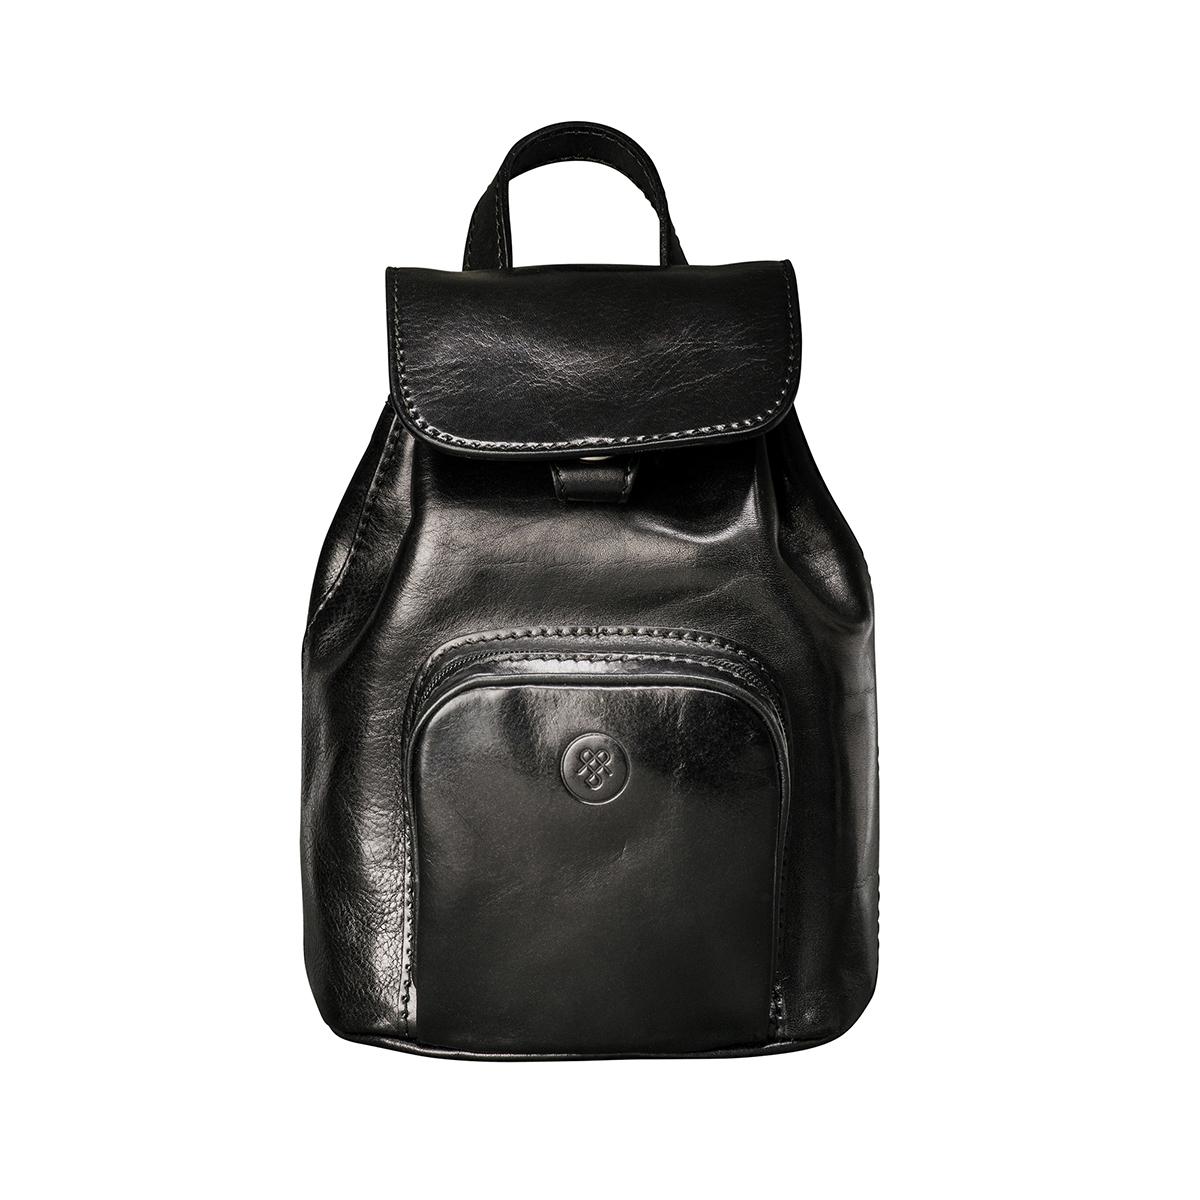 MAXWELL SCOTT BAGS Best Small Black Italian Leather Rucksack For Women